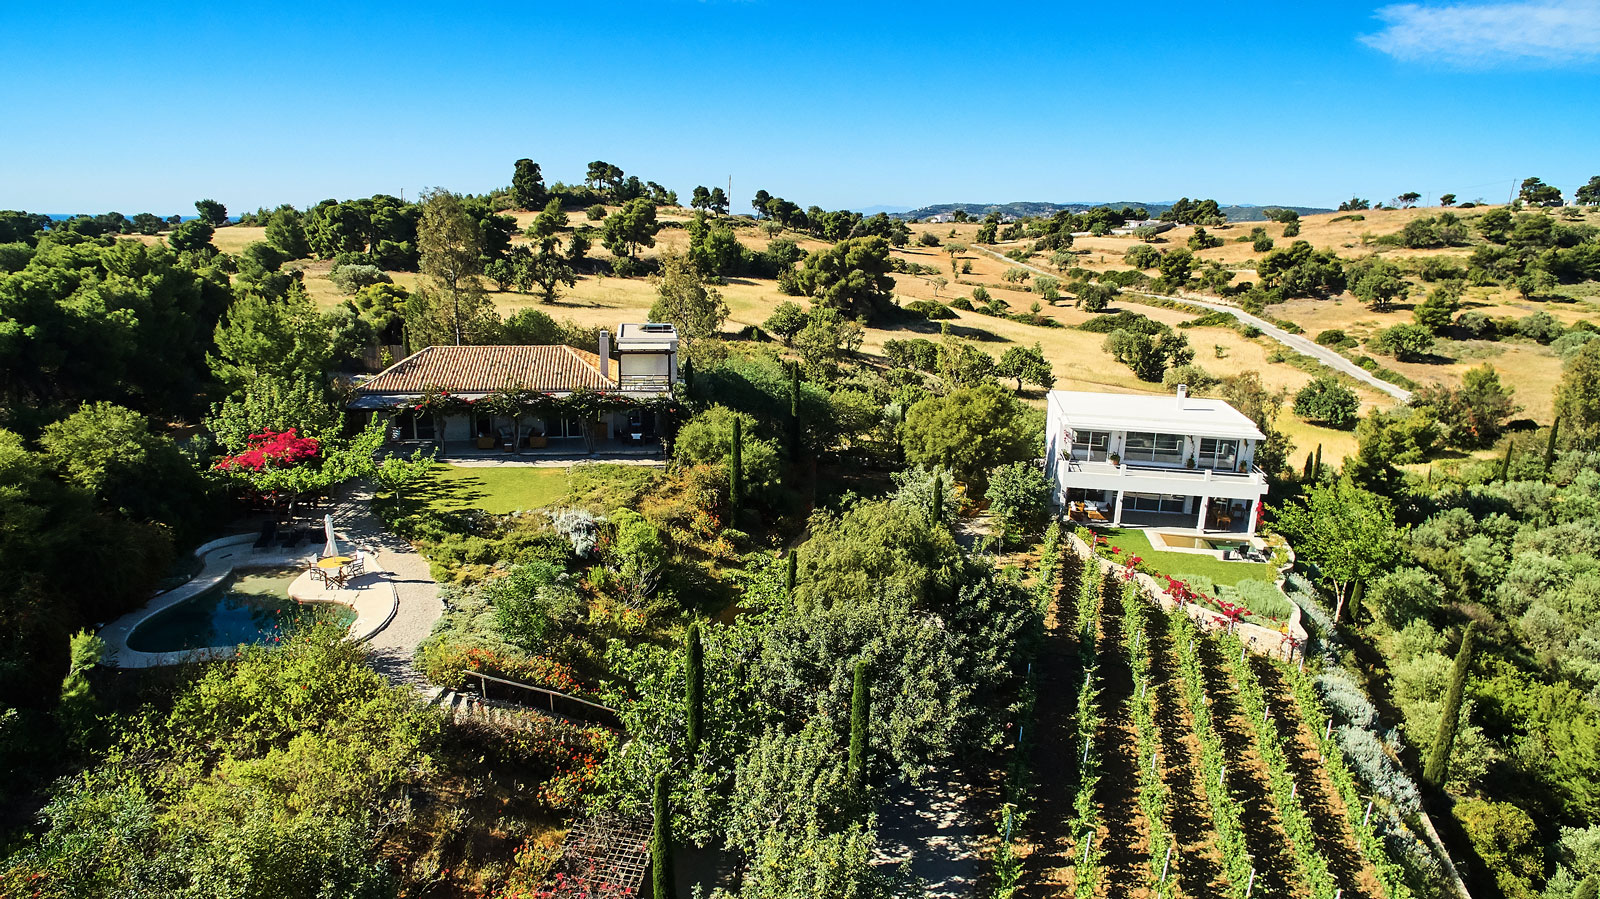 Basilico Aerial luxury villa by MYPORTOHELI